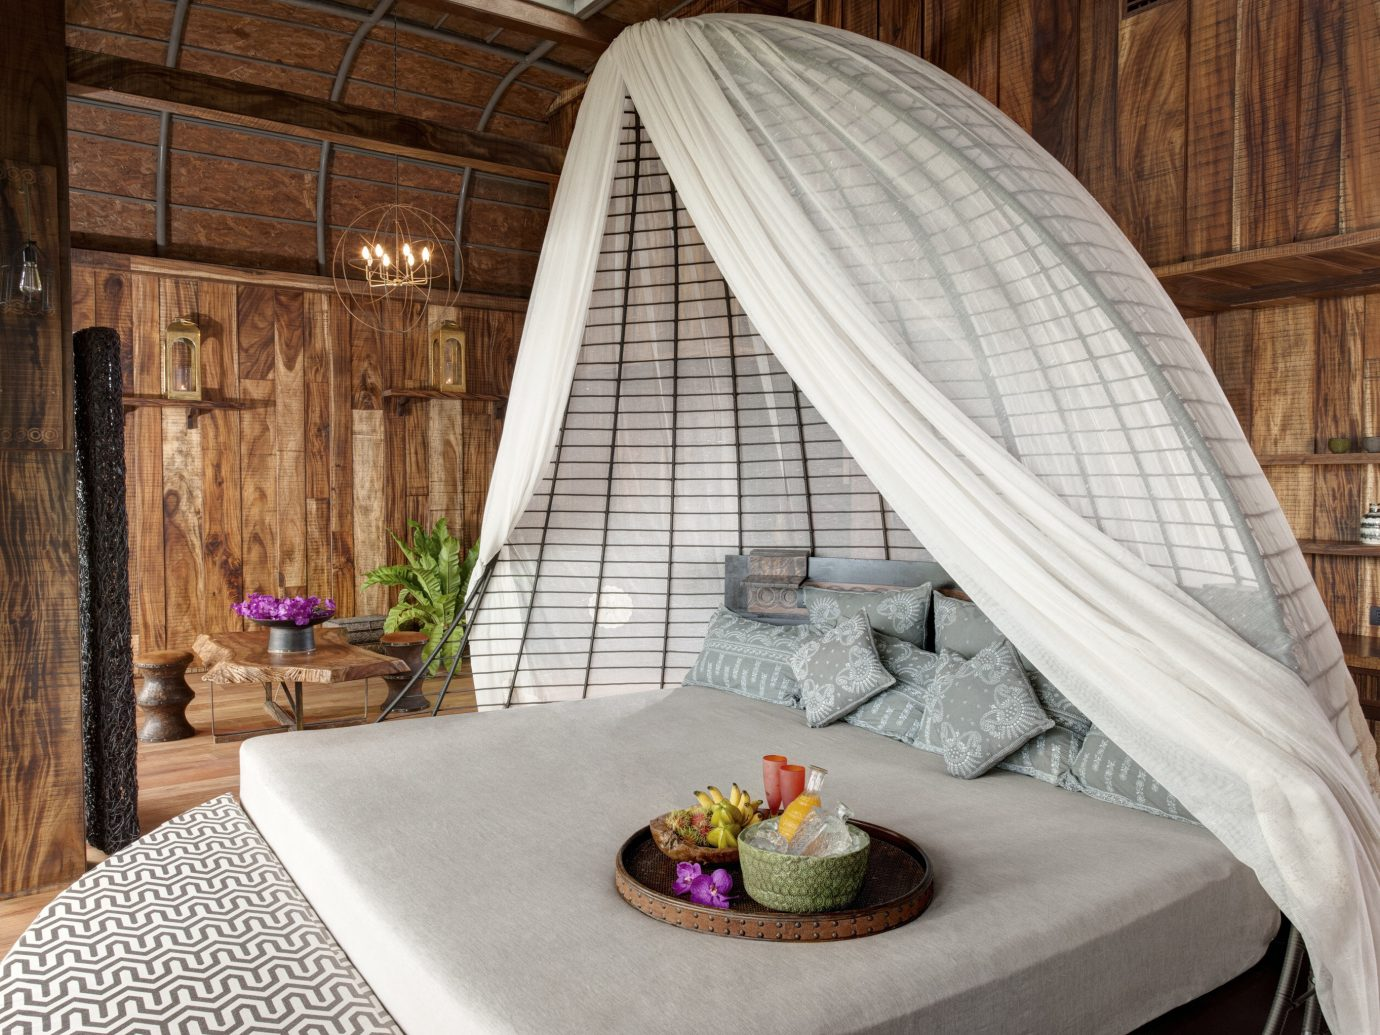 Bedroom at Keemala, Phuket, Thailand